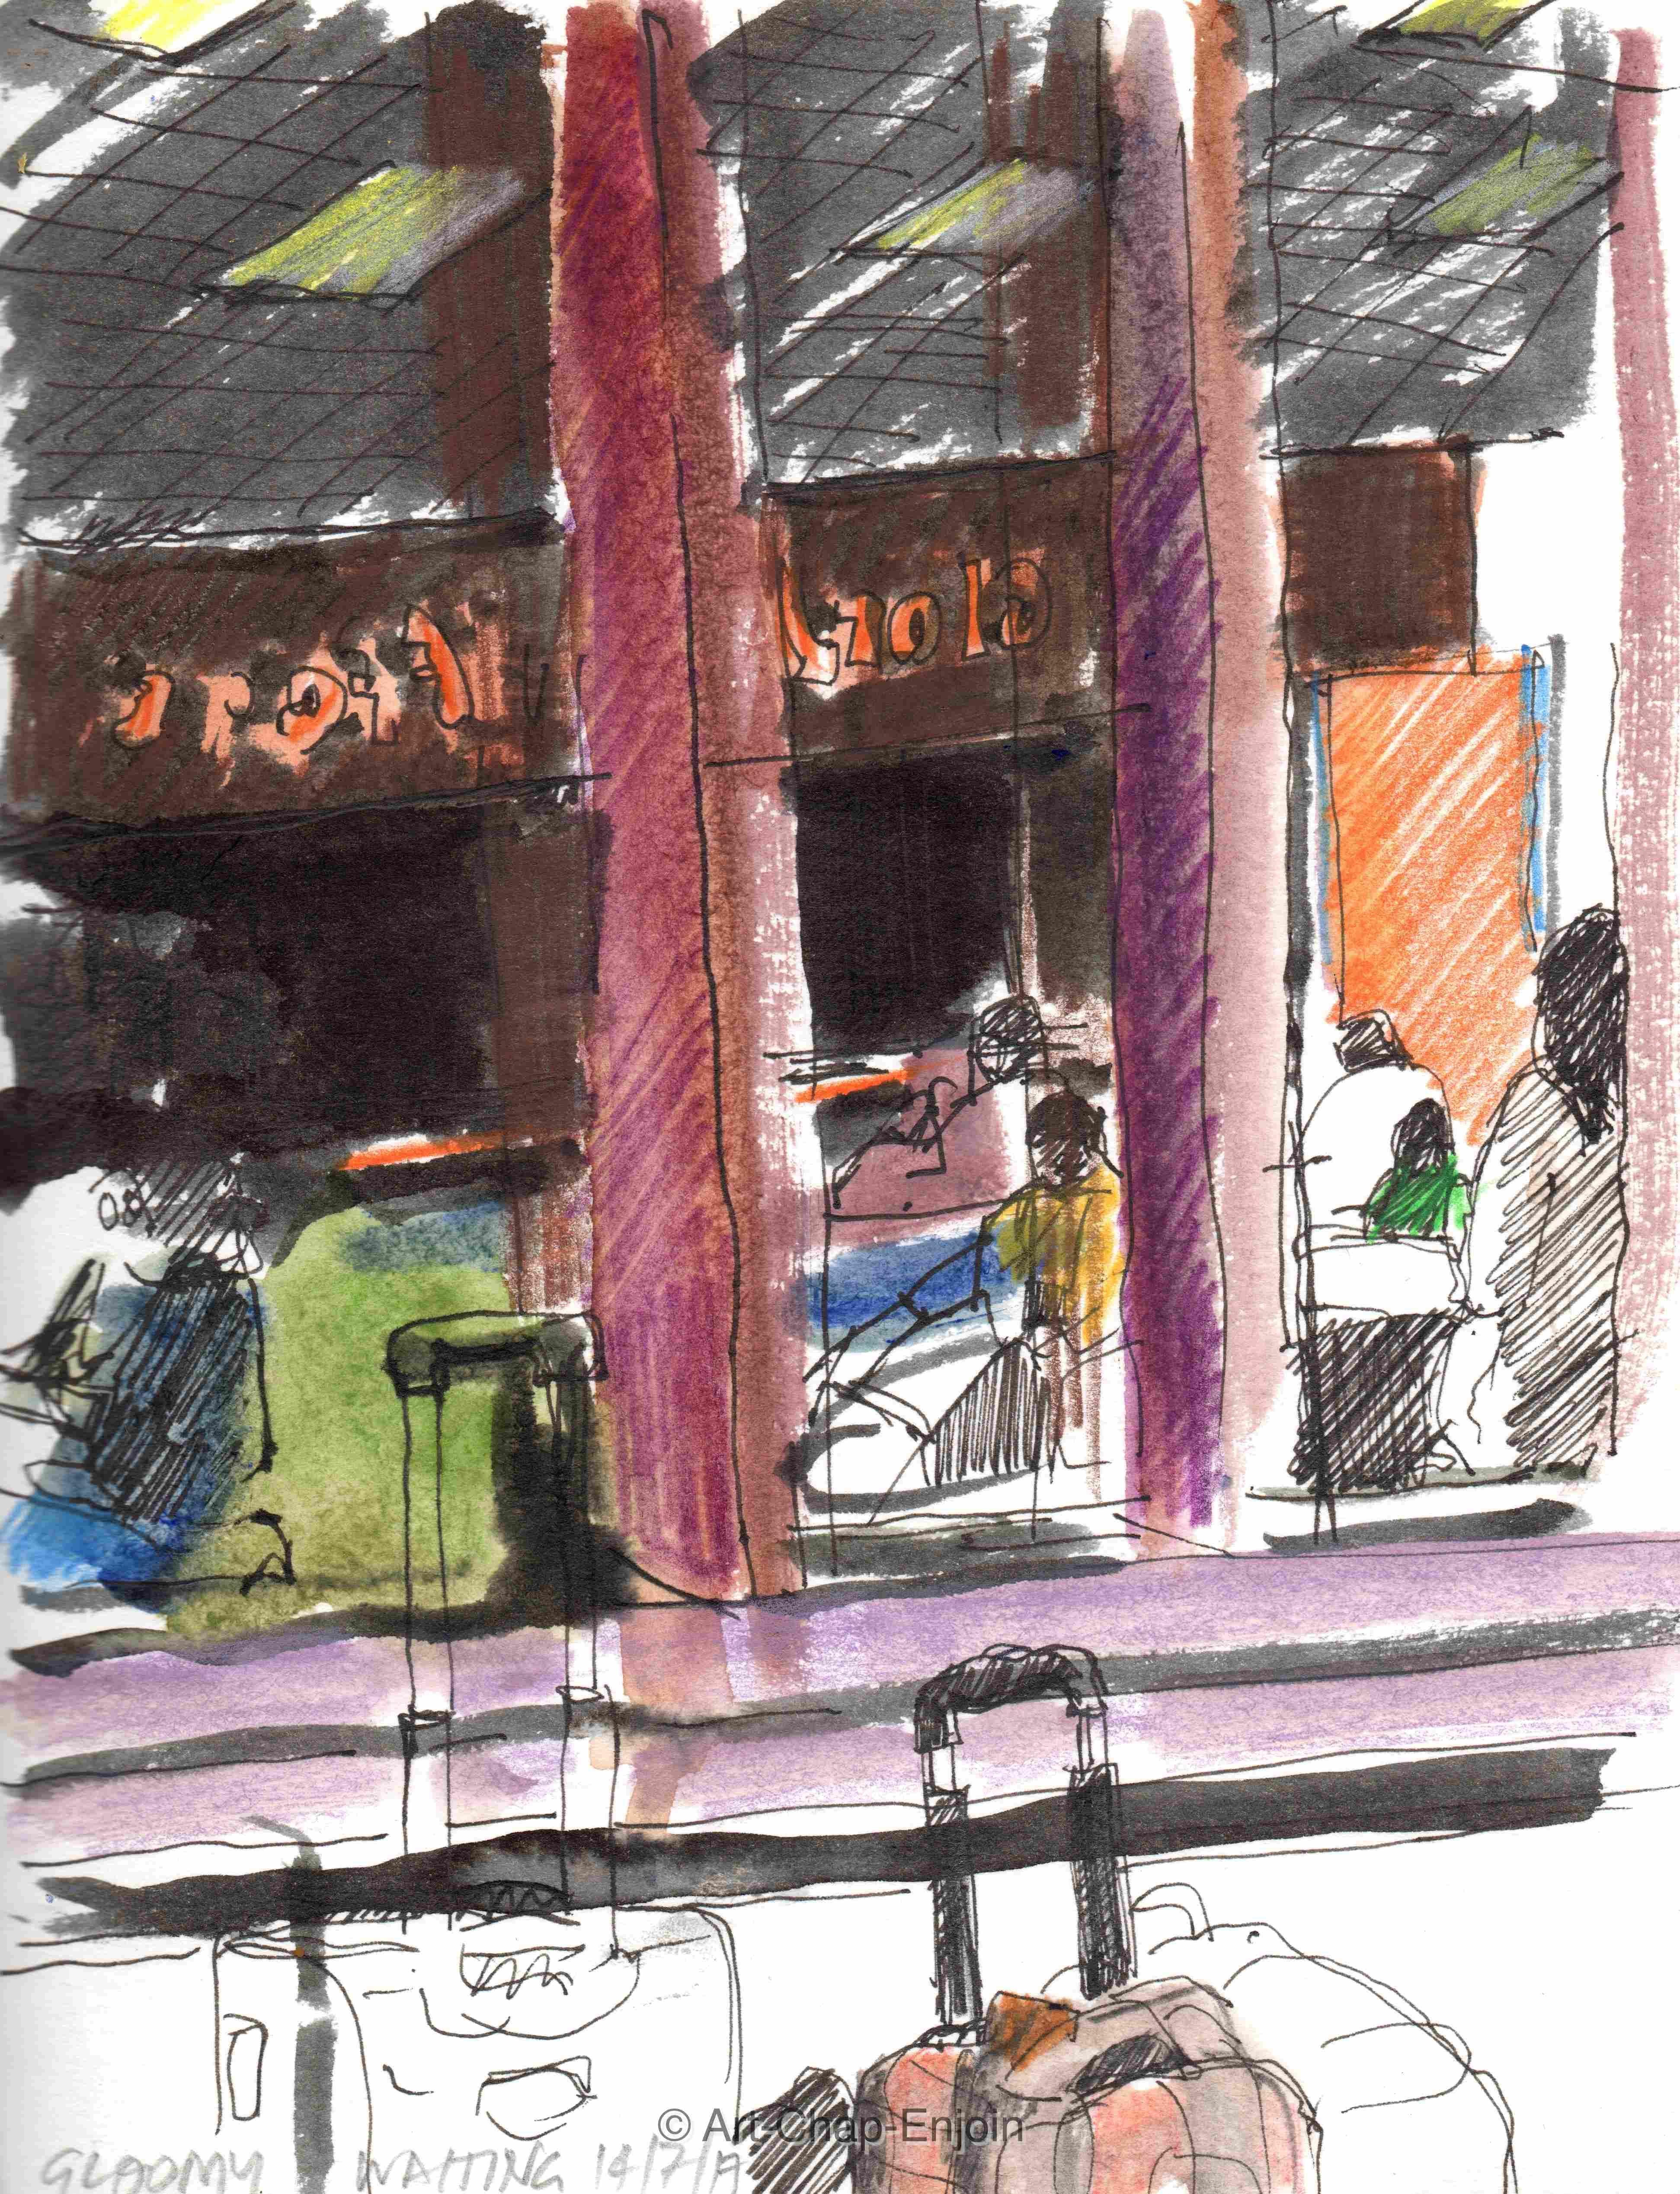 448 Gloomy waiting Artwork, Waiting, Sketches